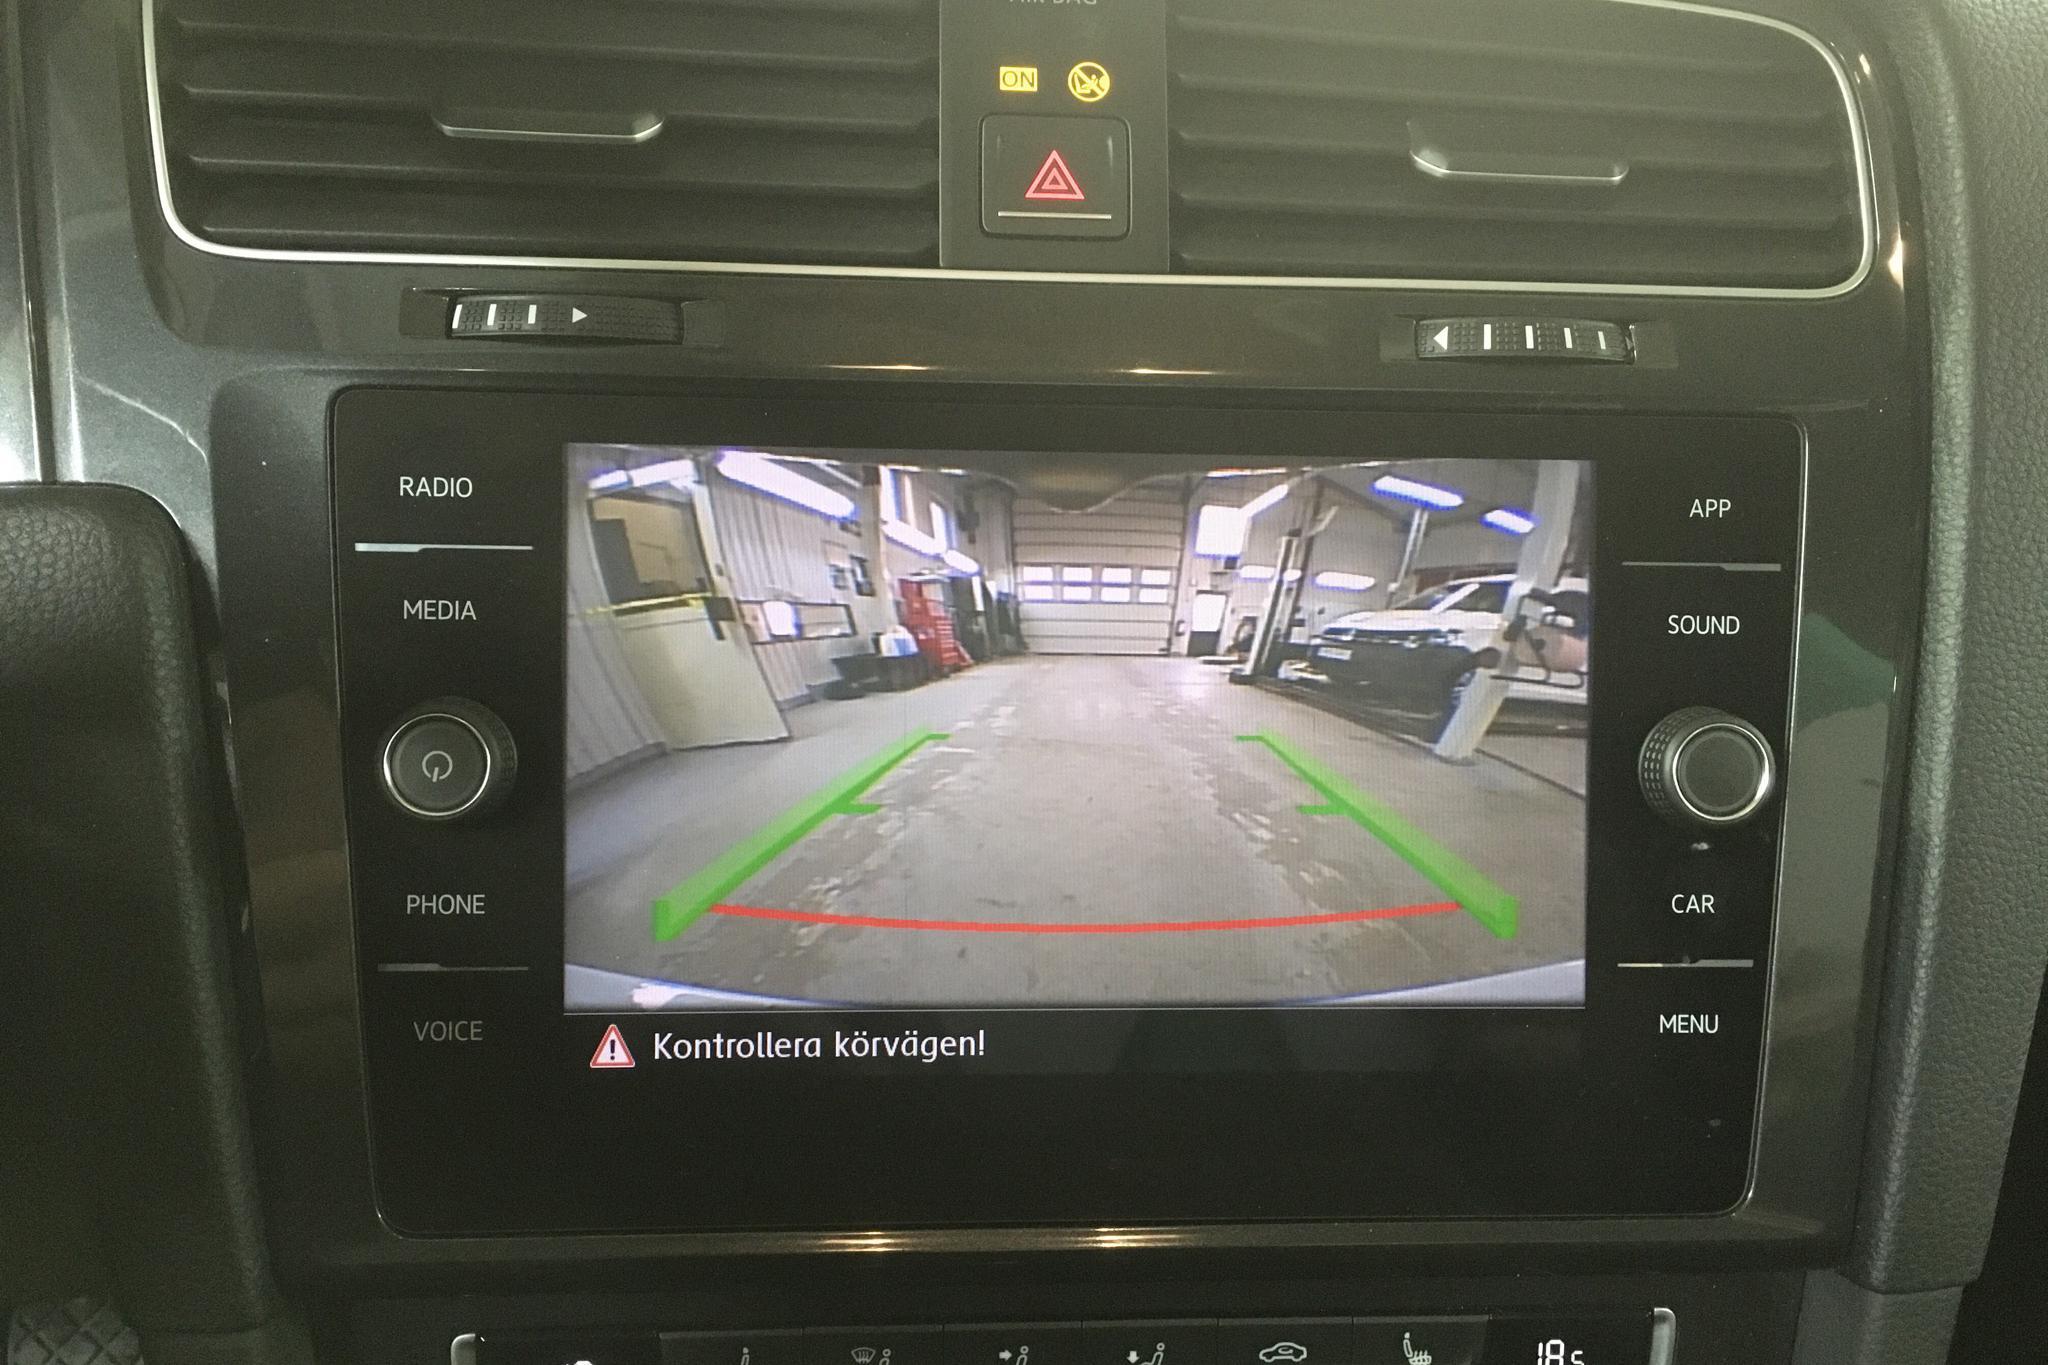 VW Golf VII 1.6 TDI Sportscombi (115hk) - 79 150 km - Manual - white - 2018